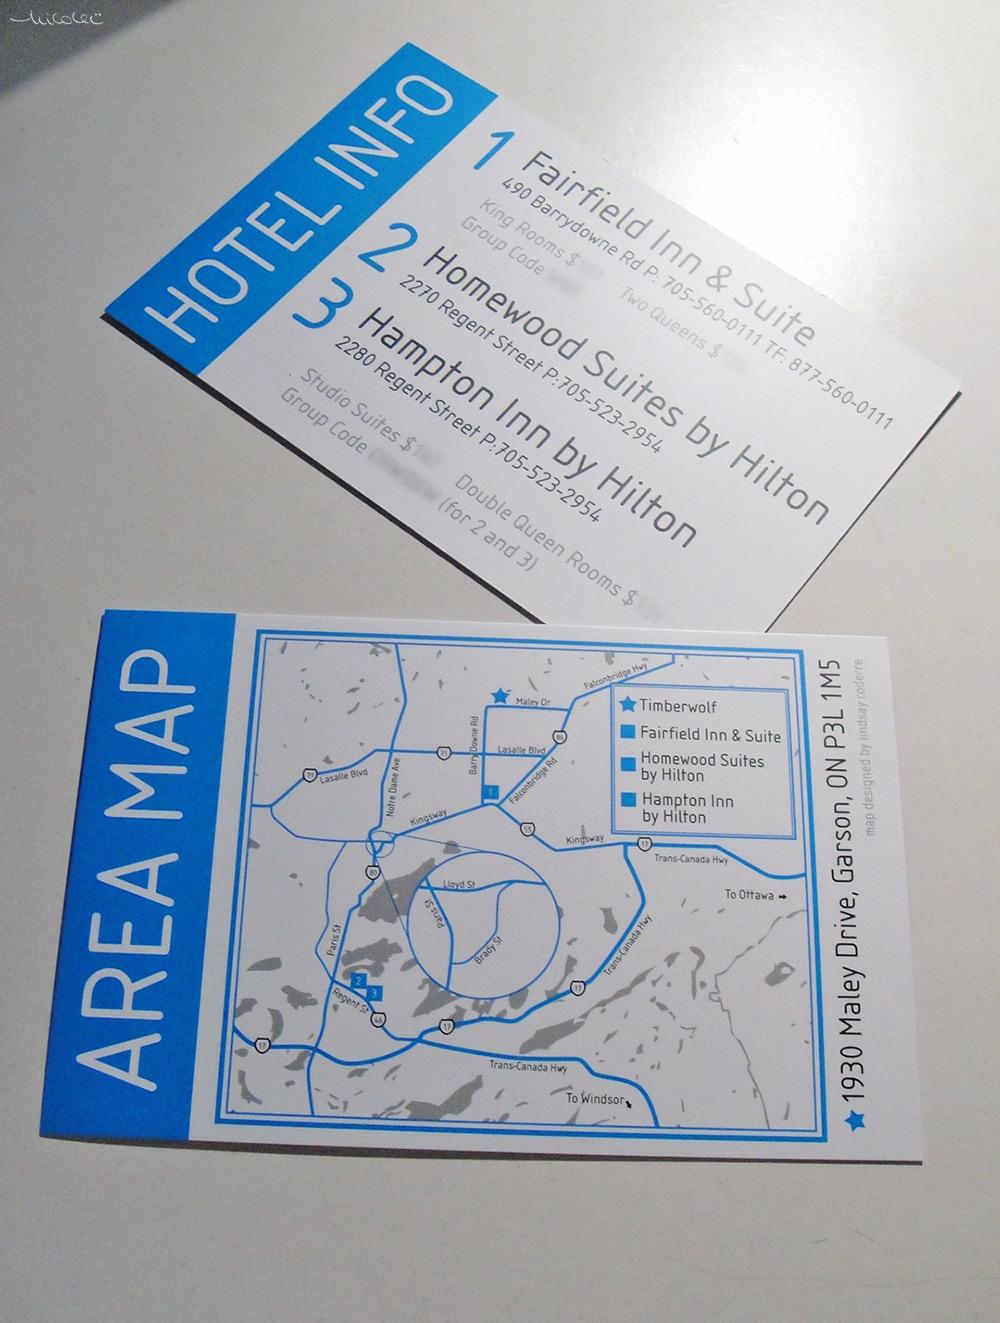 Map-Hotel Card